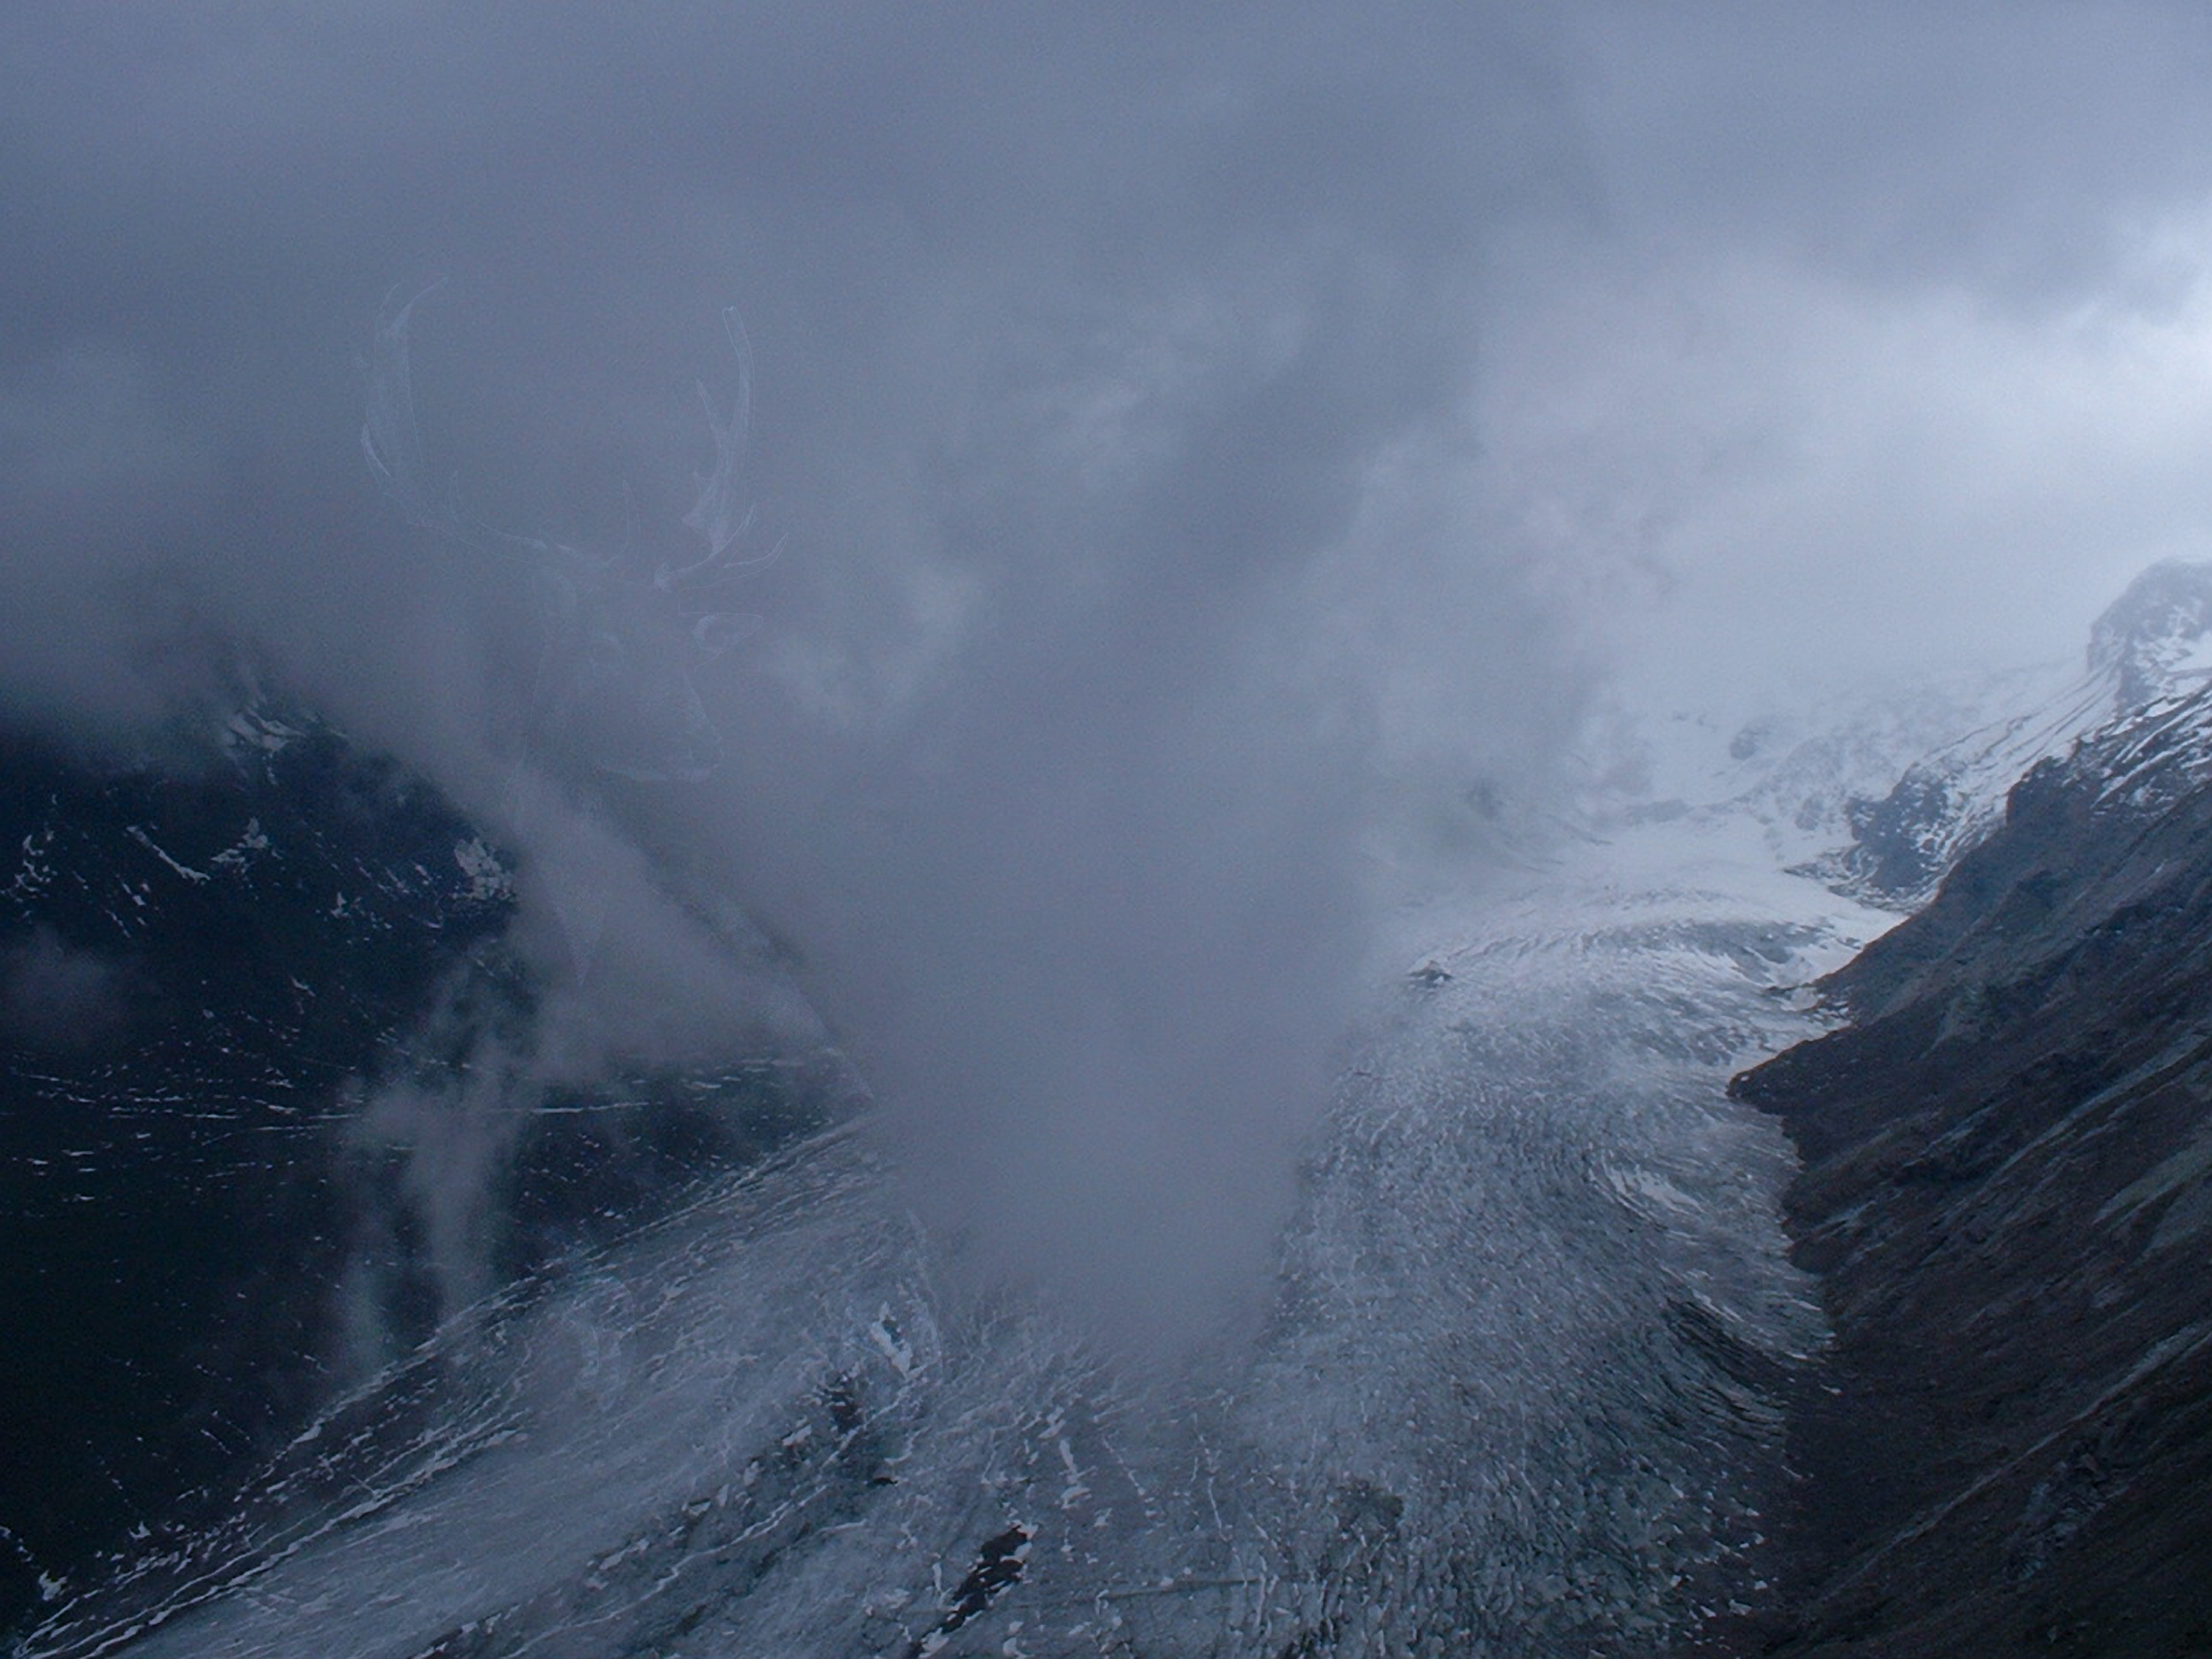 MWD 13; Contest; Großglockner; Glacier; Fog; Mist